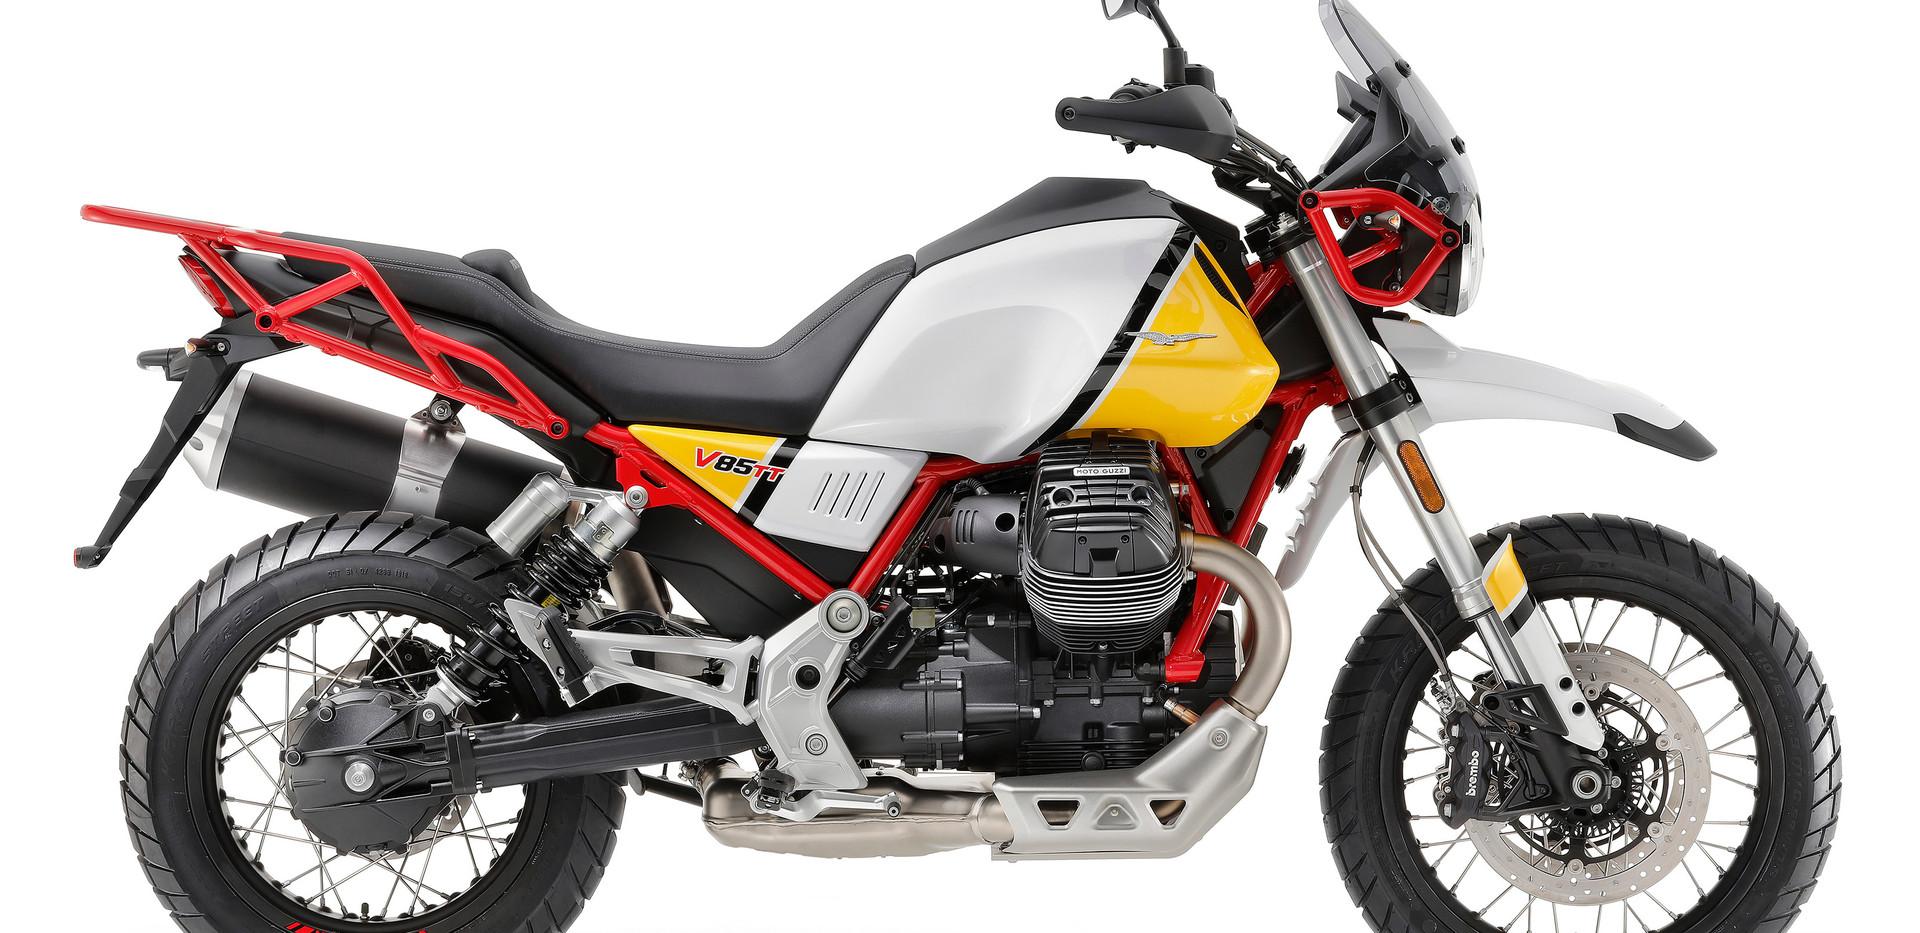 Moto Guzzi V85 TT Amarilla